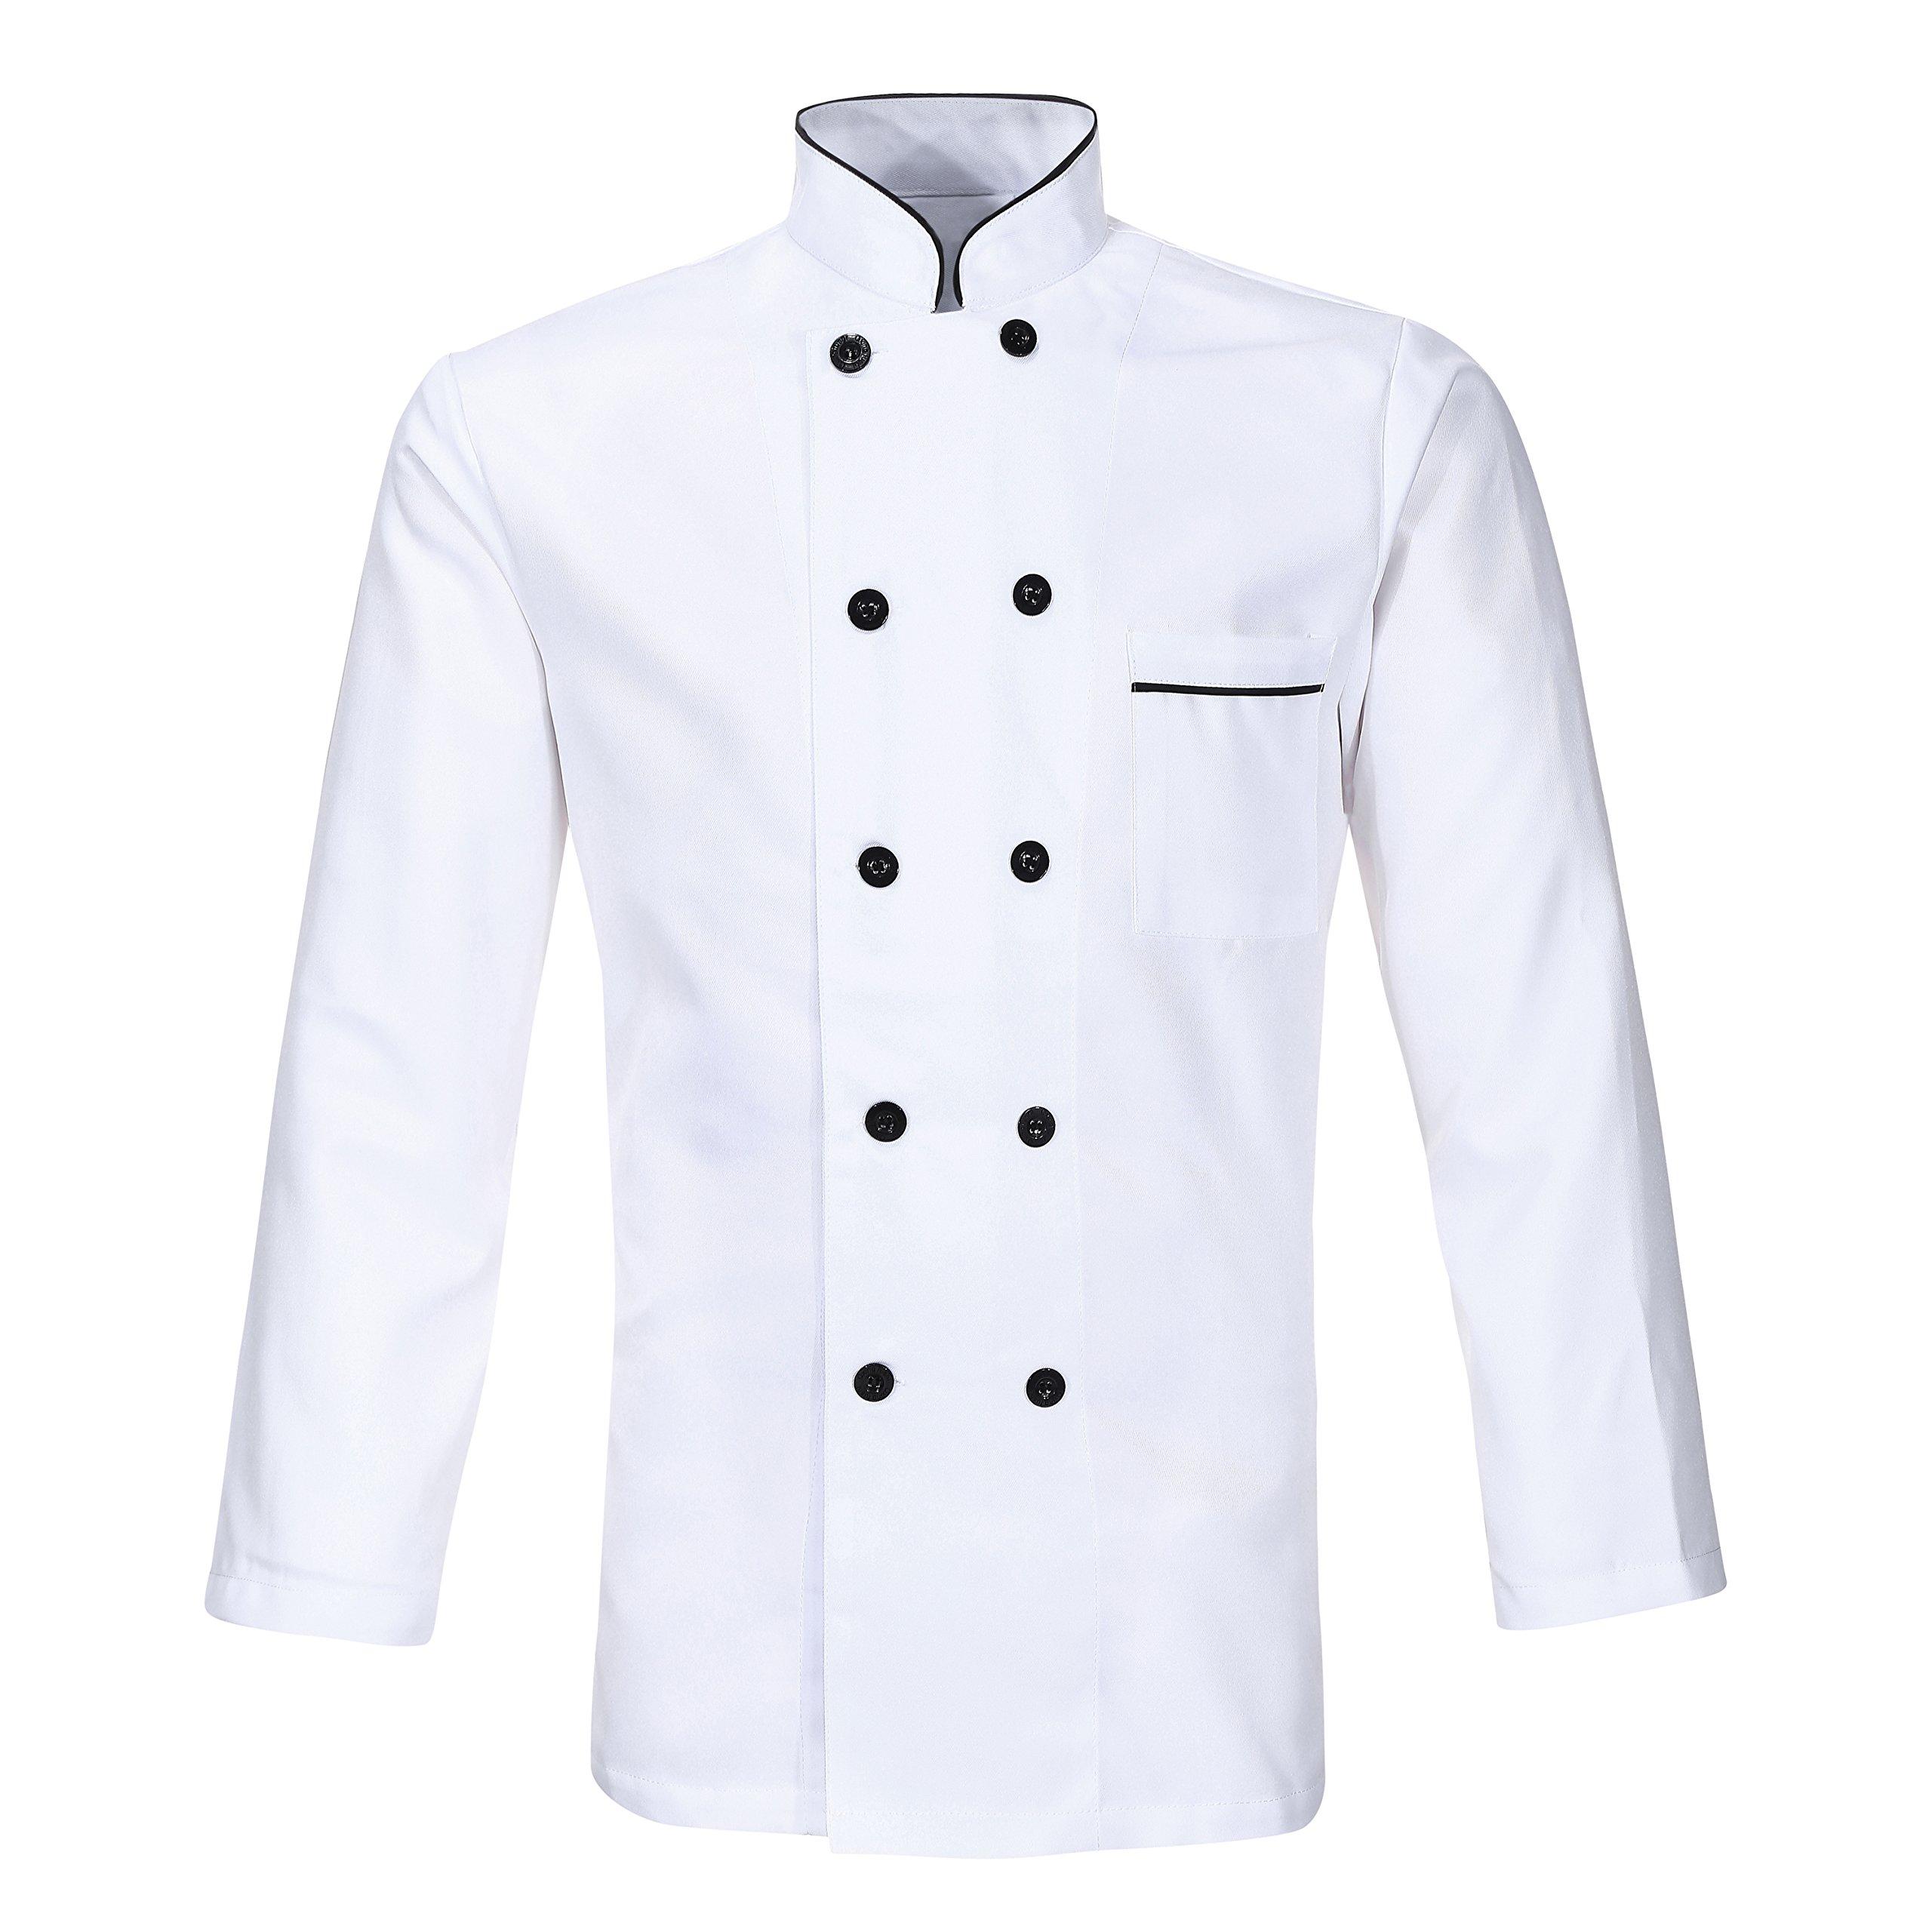 Nanxson(TM Hotel/Kitchen Uniform Long Sleeved Working Chef Vest CFM0001 (XXL, White)